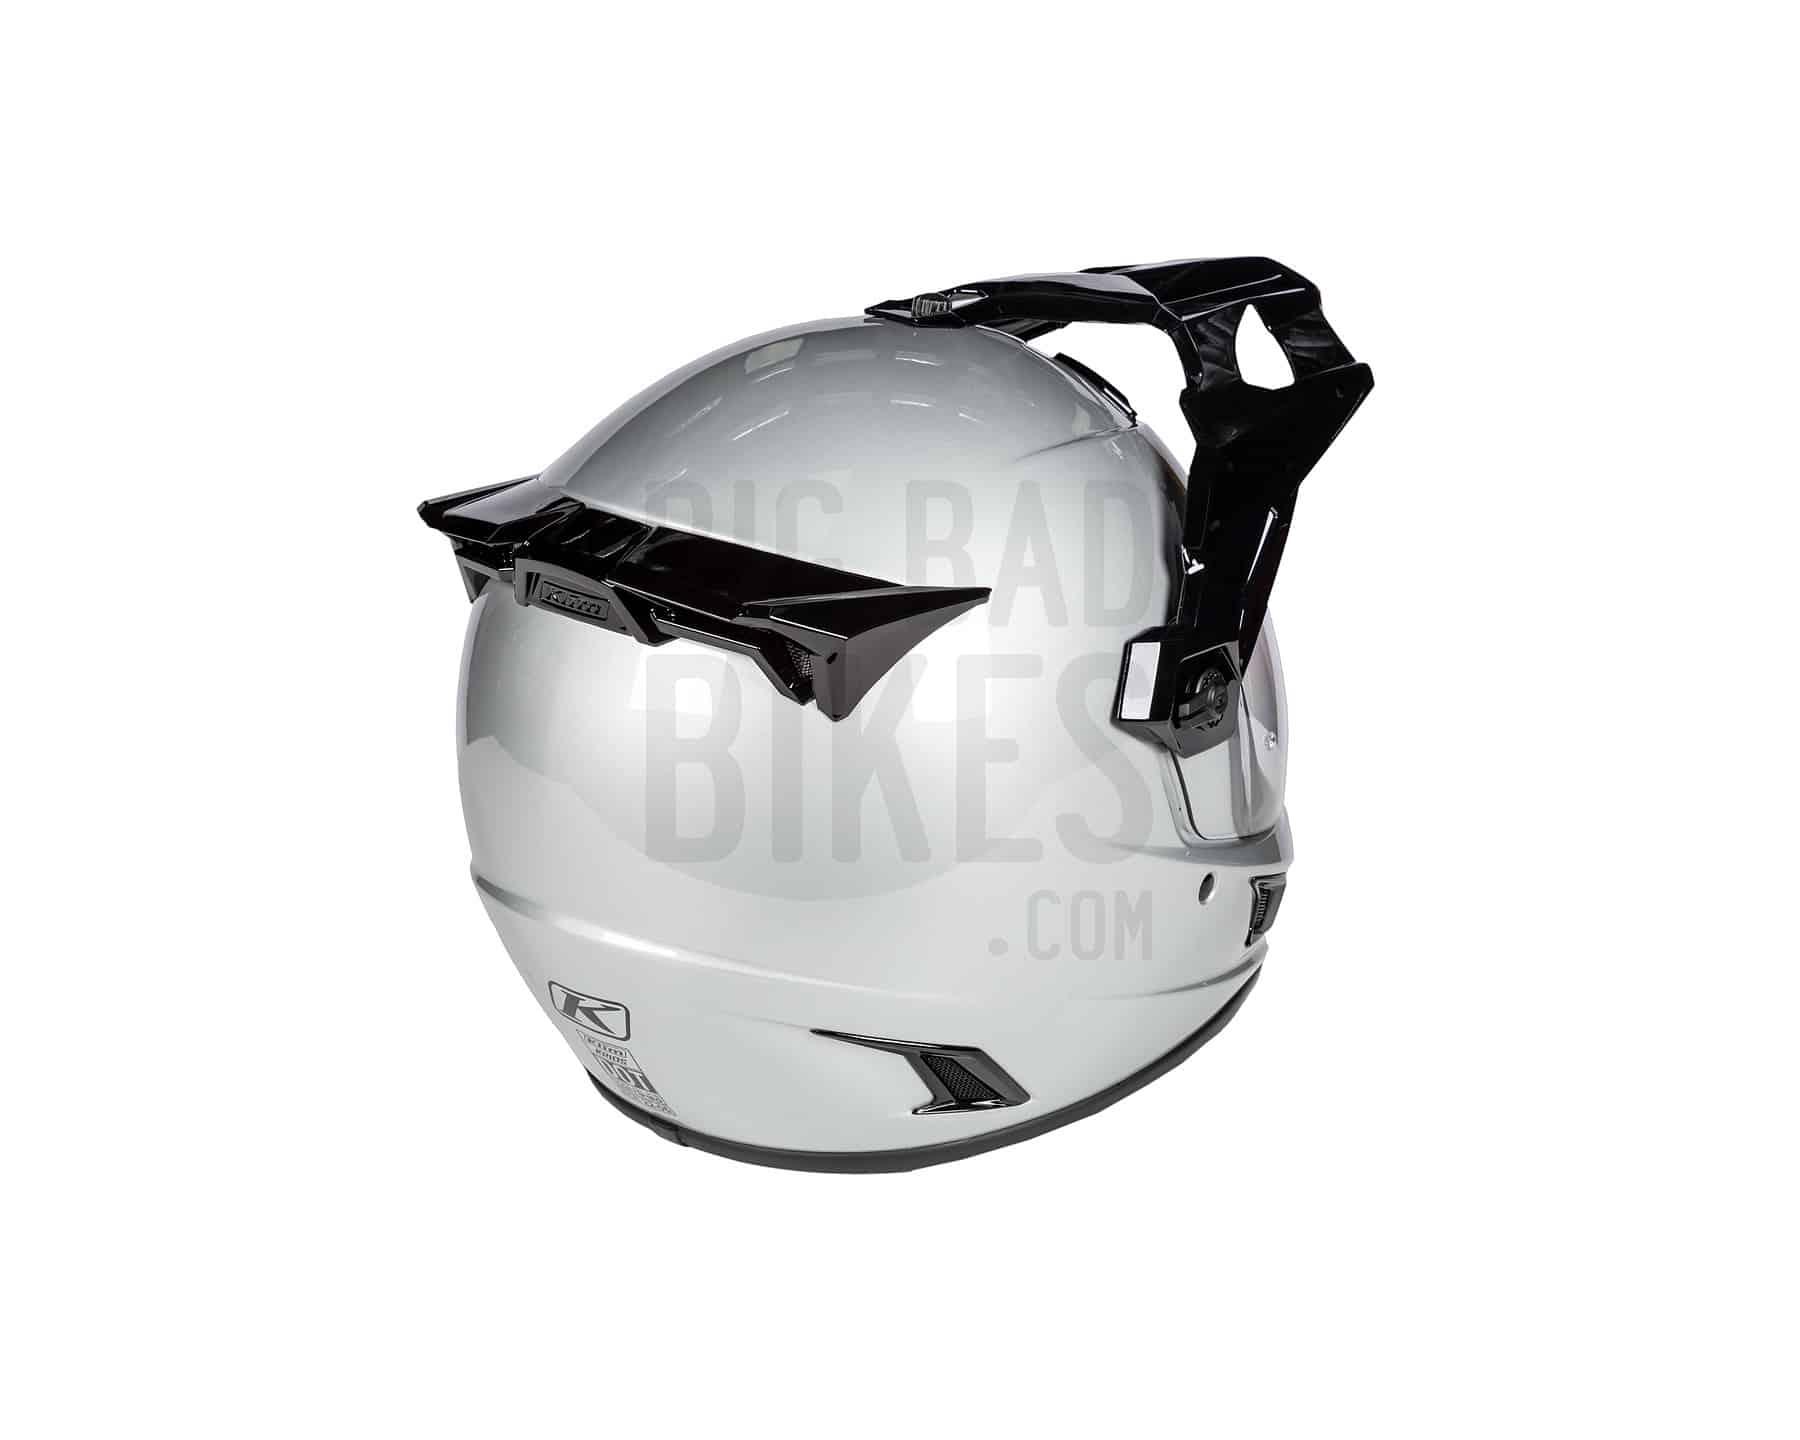 3510-000_Gloss Silver_02